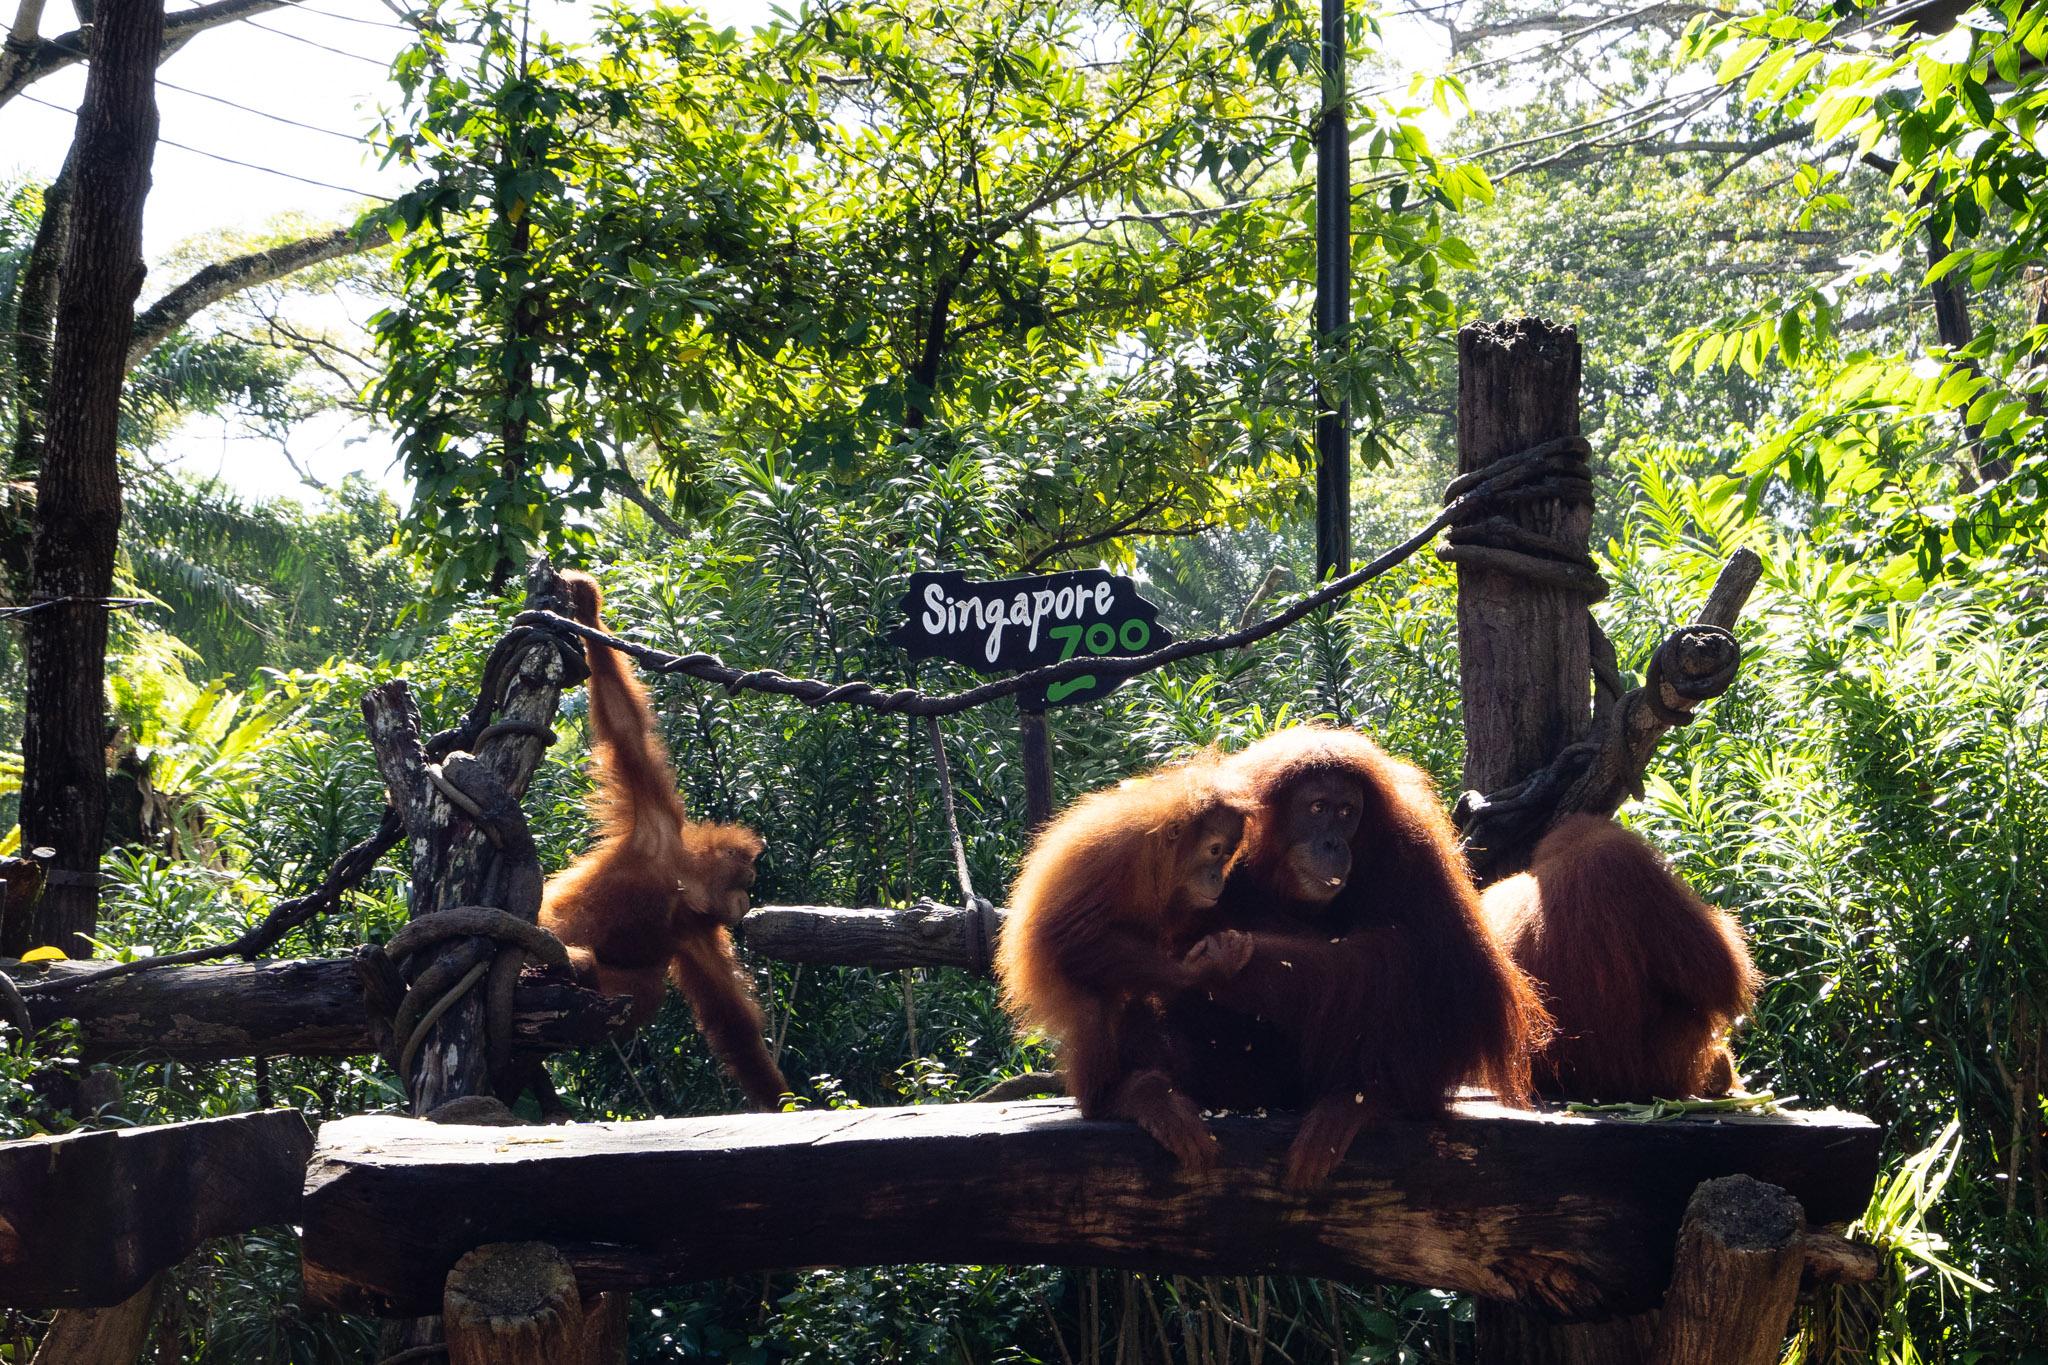 viator-singapore-photographer-tourism-tours-zoo-little-india-gardens-marina-bay-008.jpg